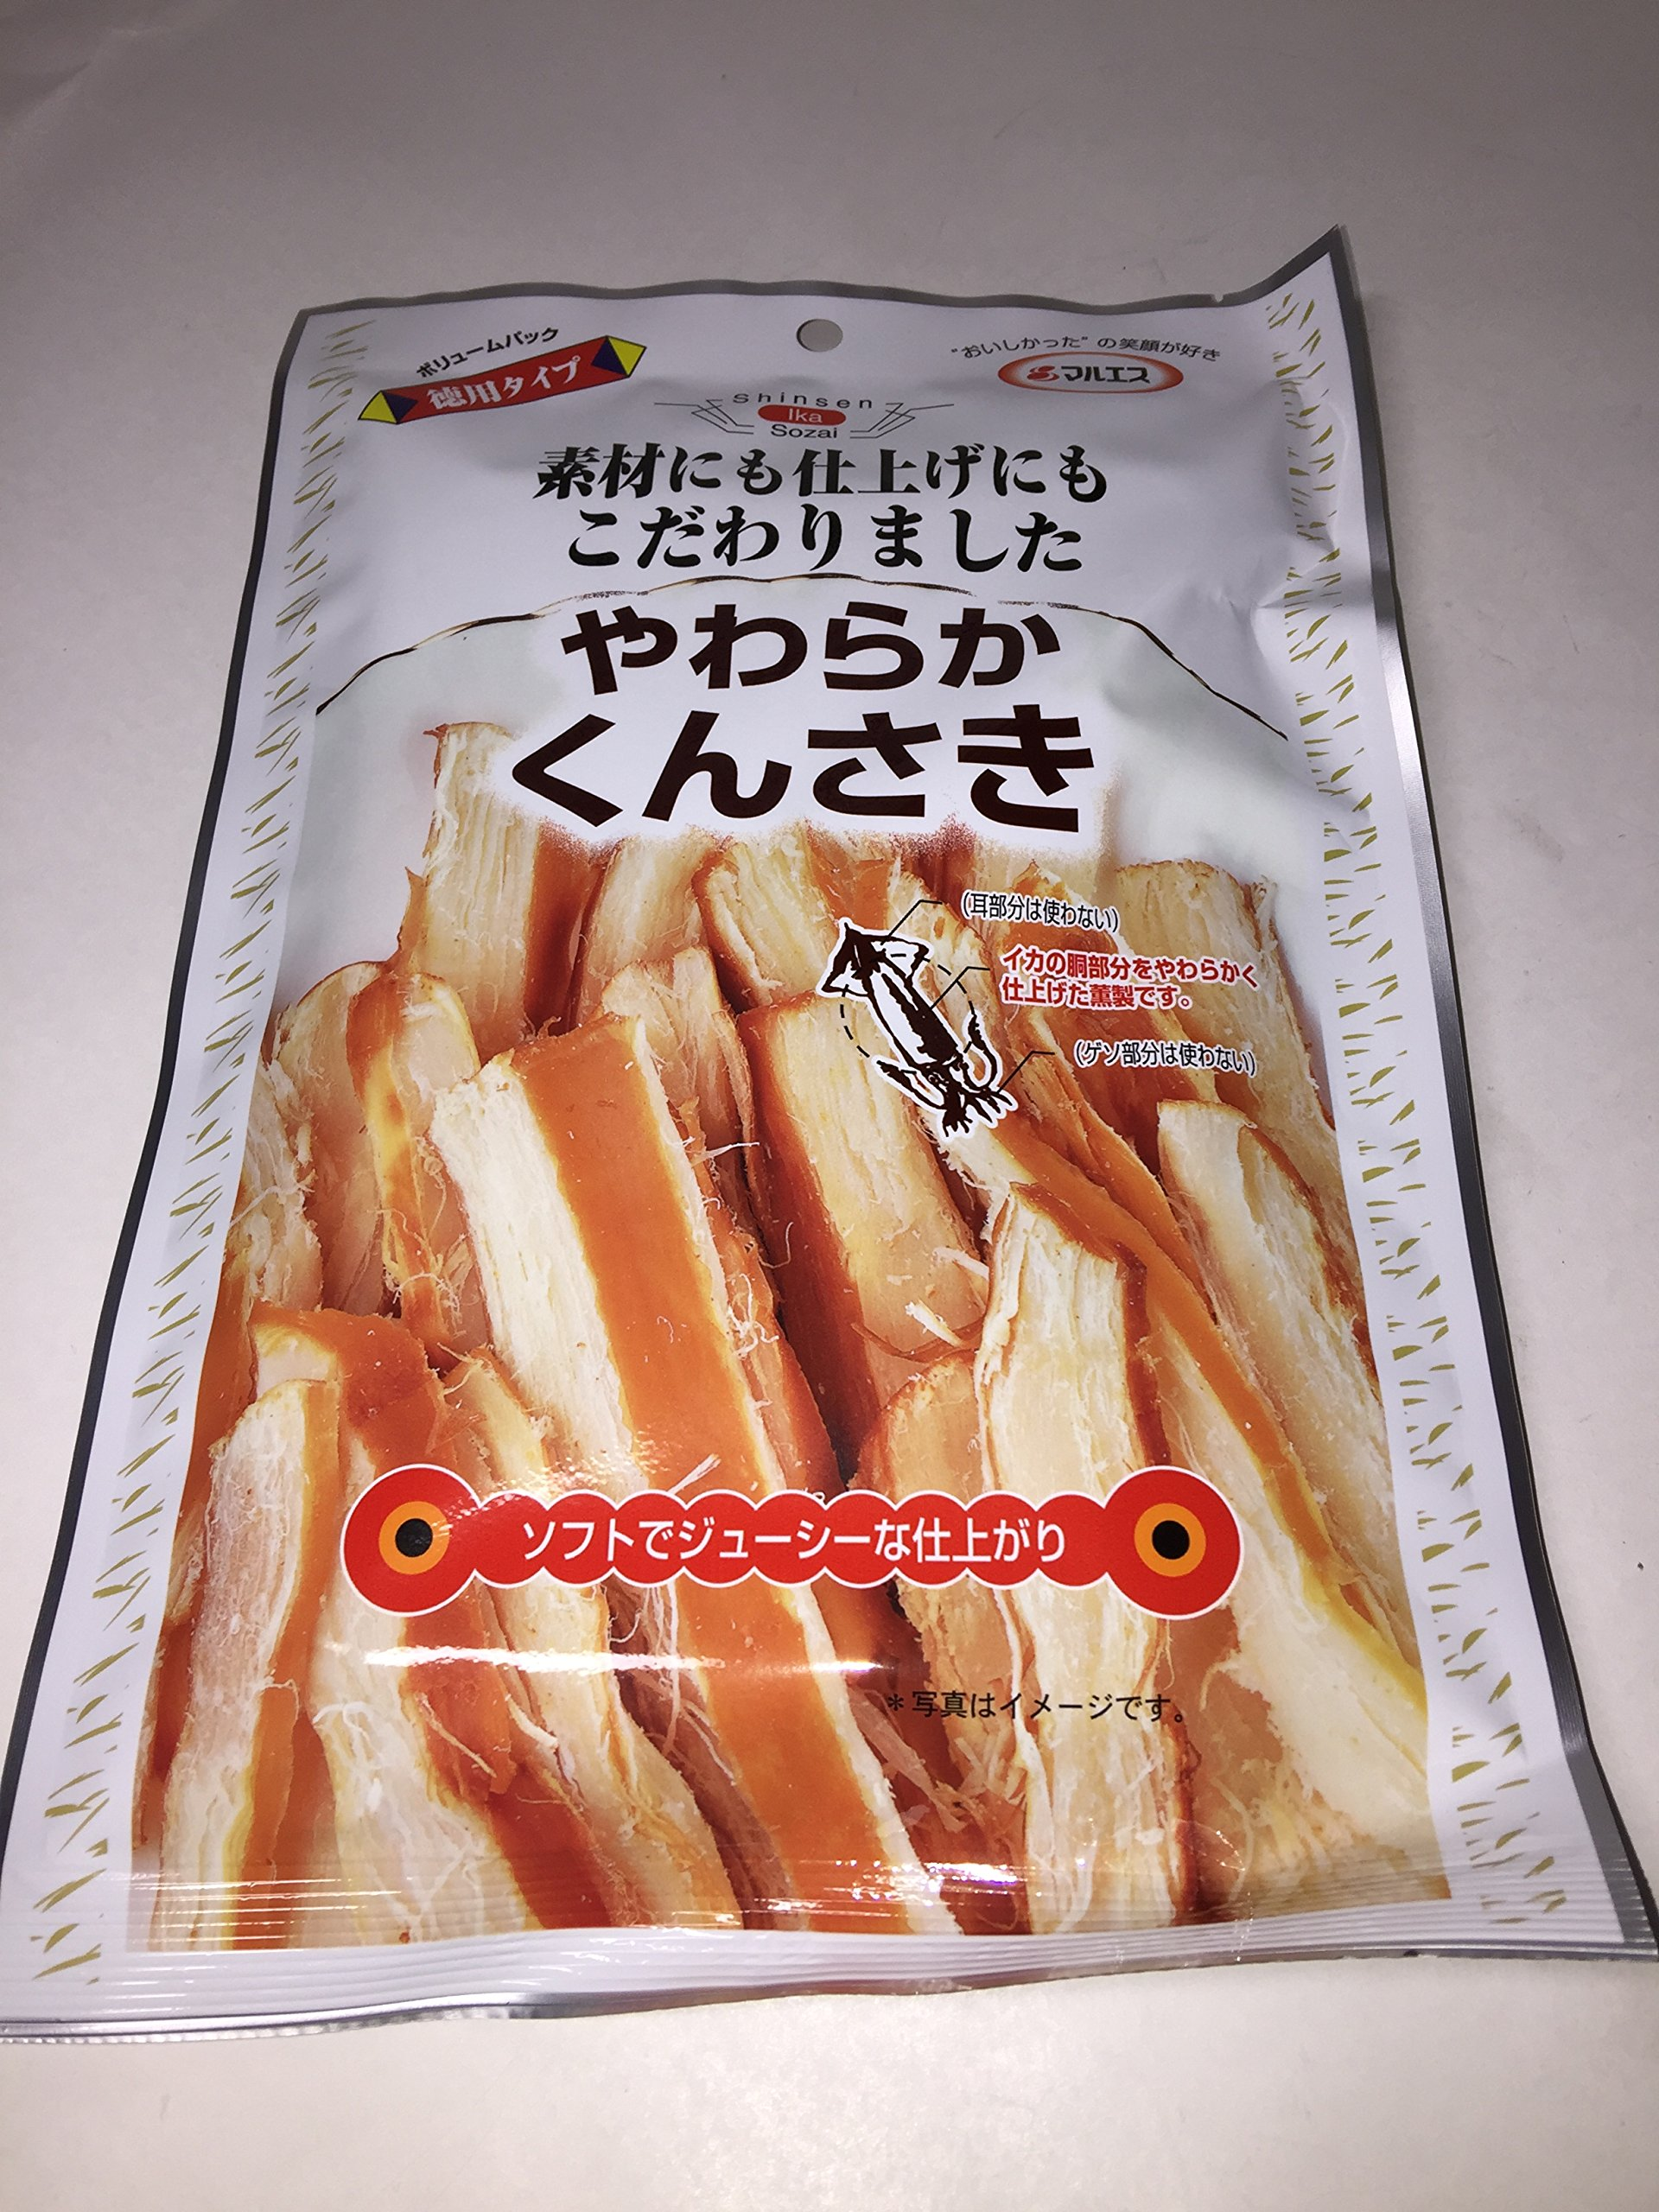 Otsumami 3 pack set Smoked squid, baked sardine, pickles by KINJOKEN MARUESU MIZUTAMARI (Image #3)